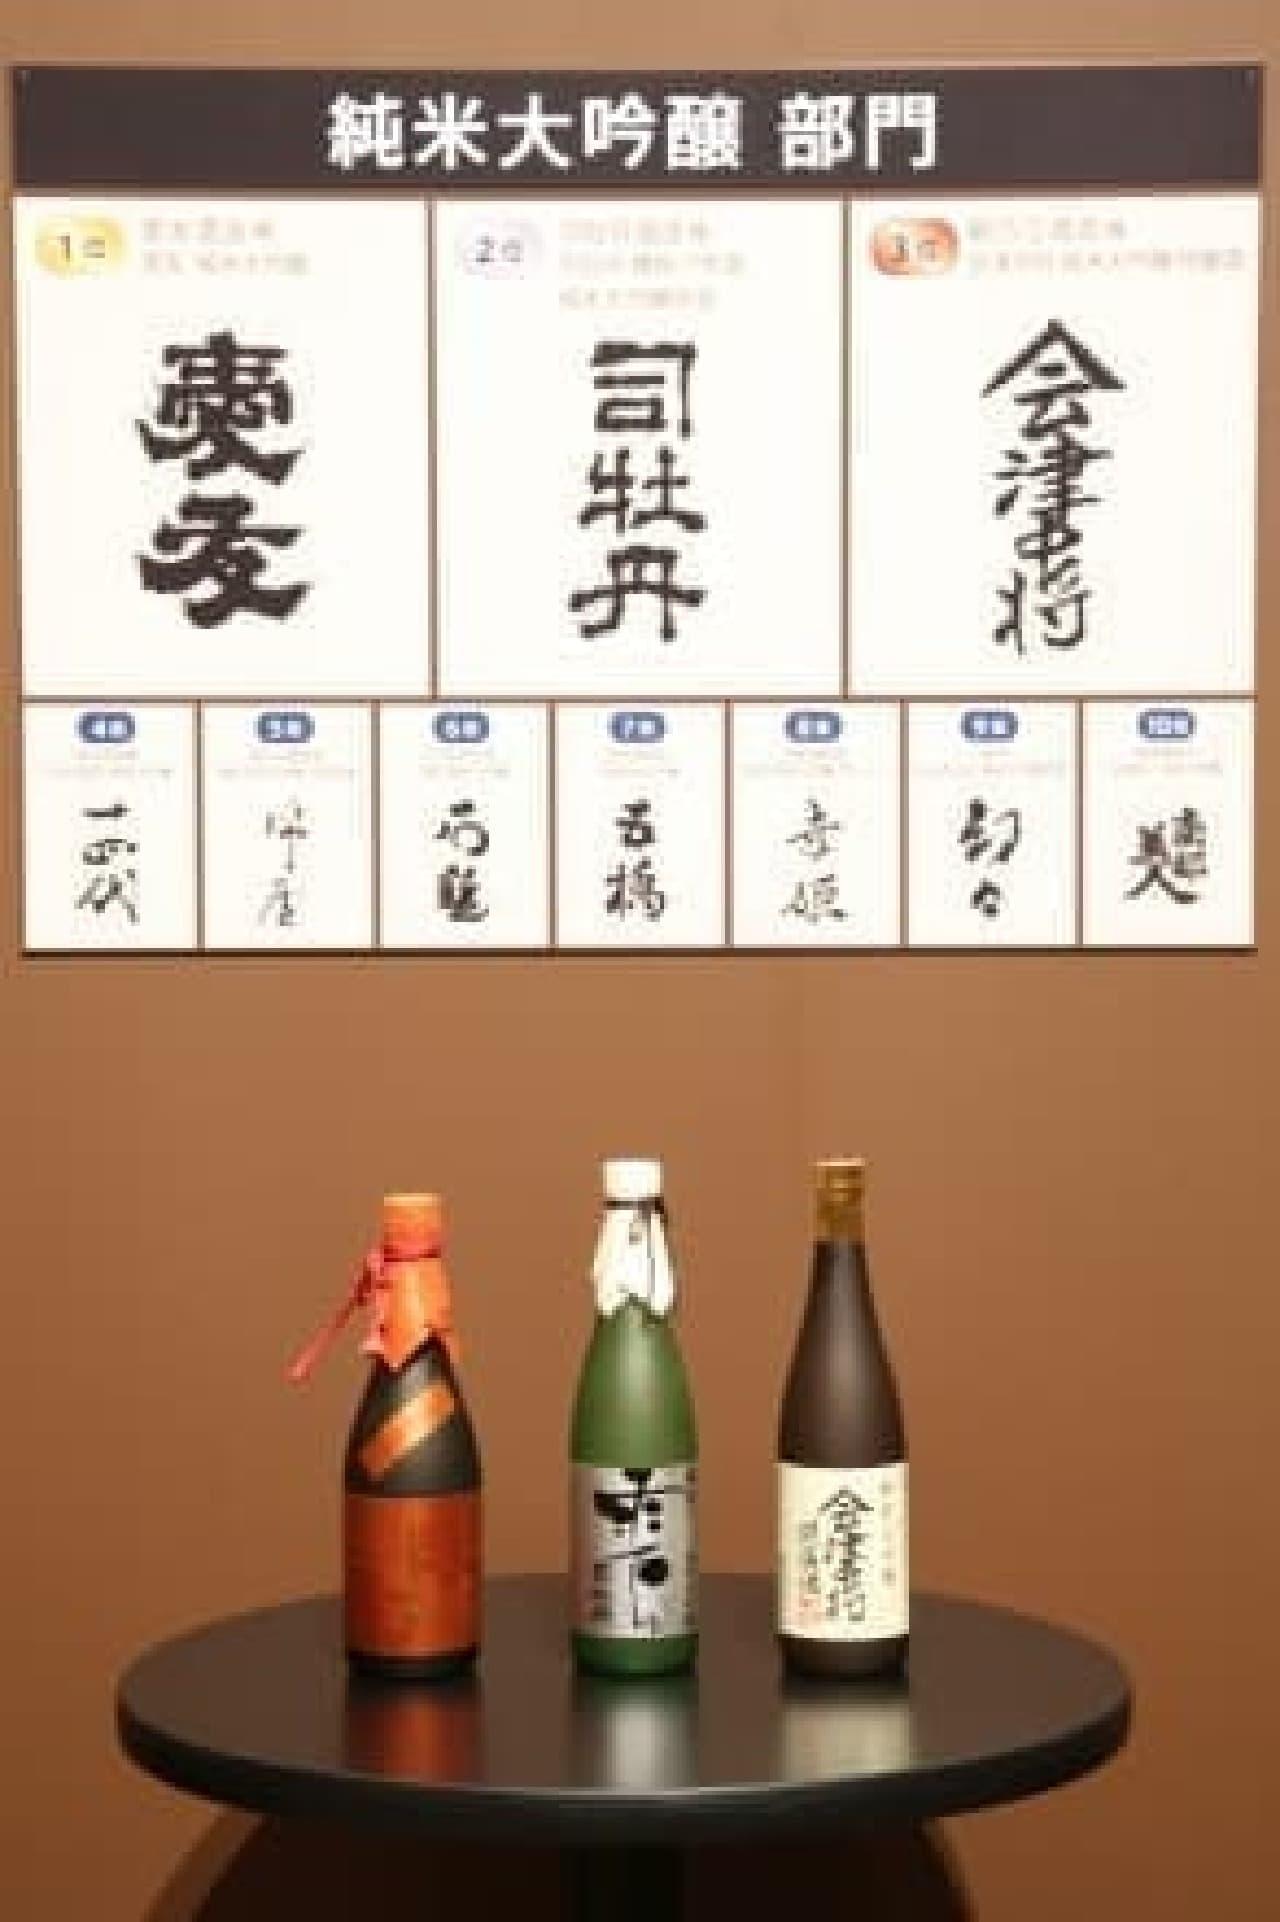 SAKE COMPETITION 2016純米大吟醸部門受賞銘柄